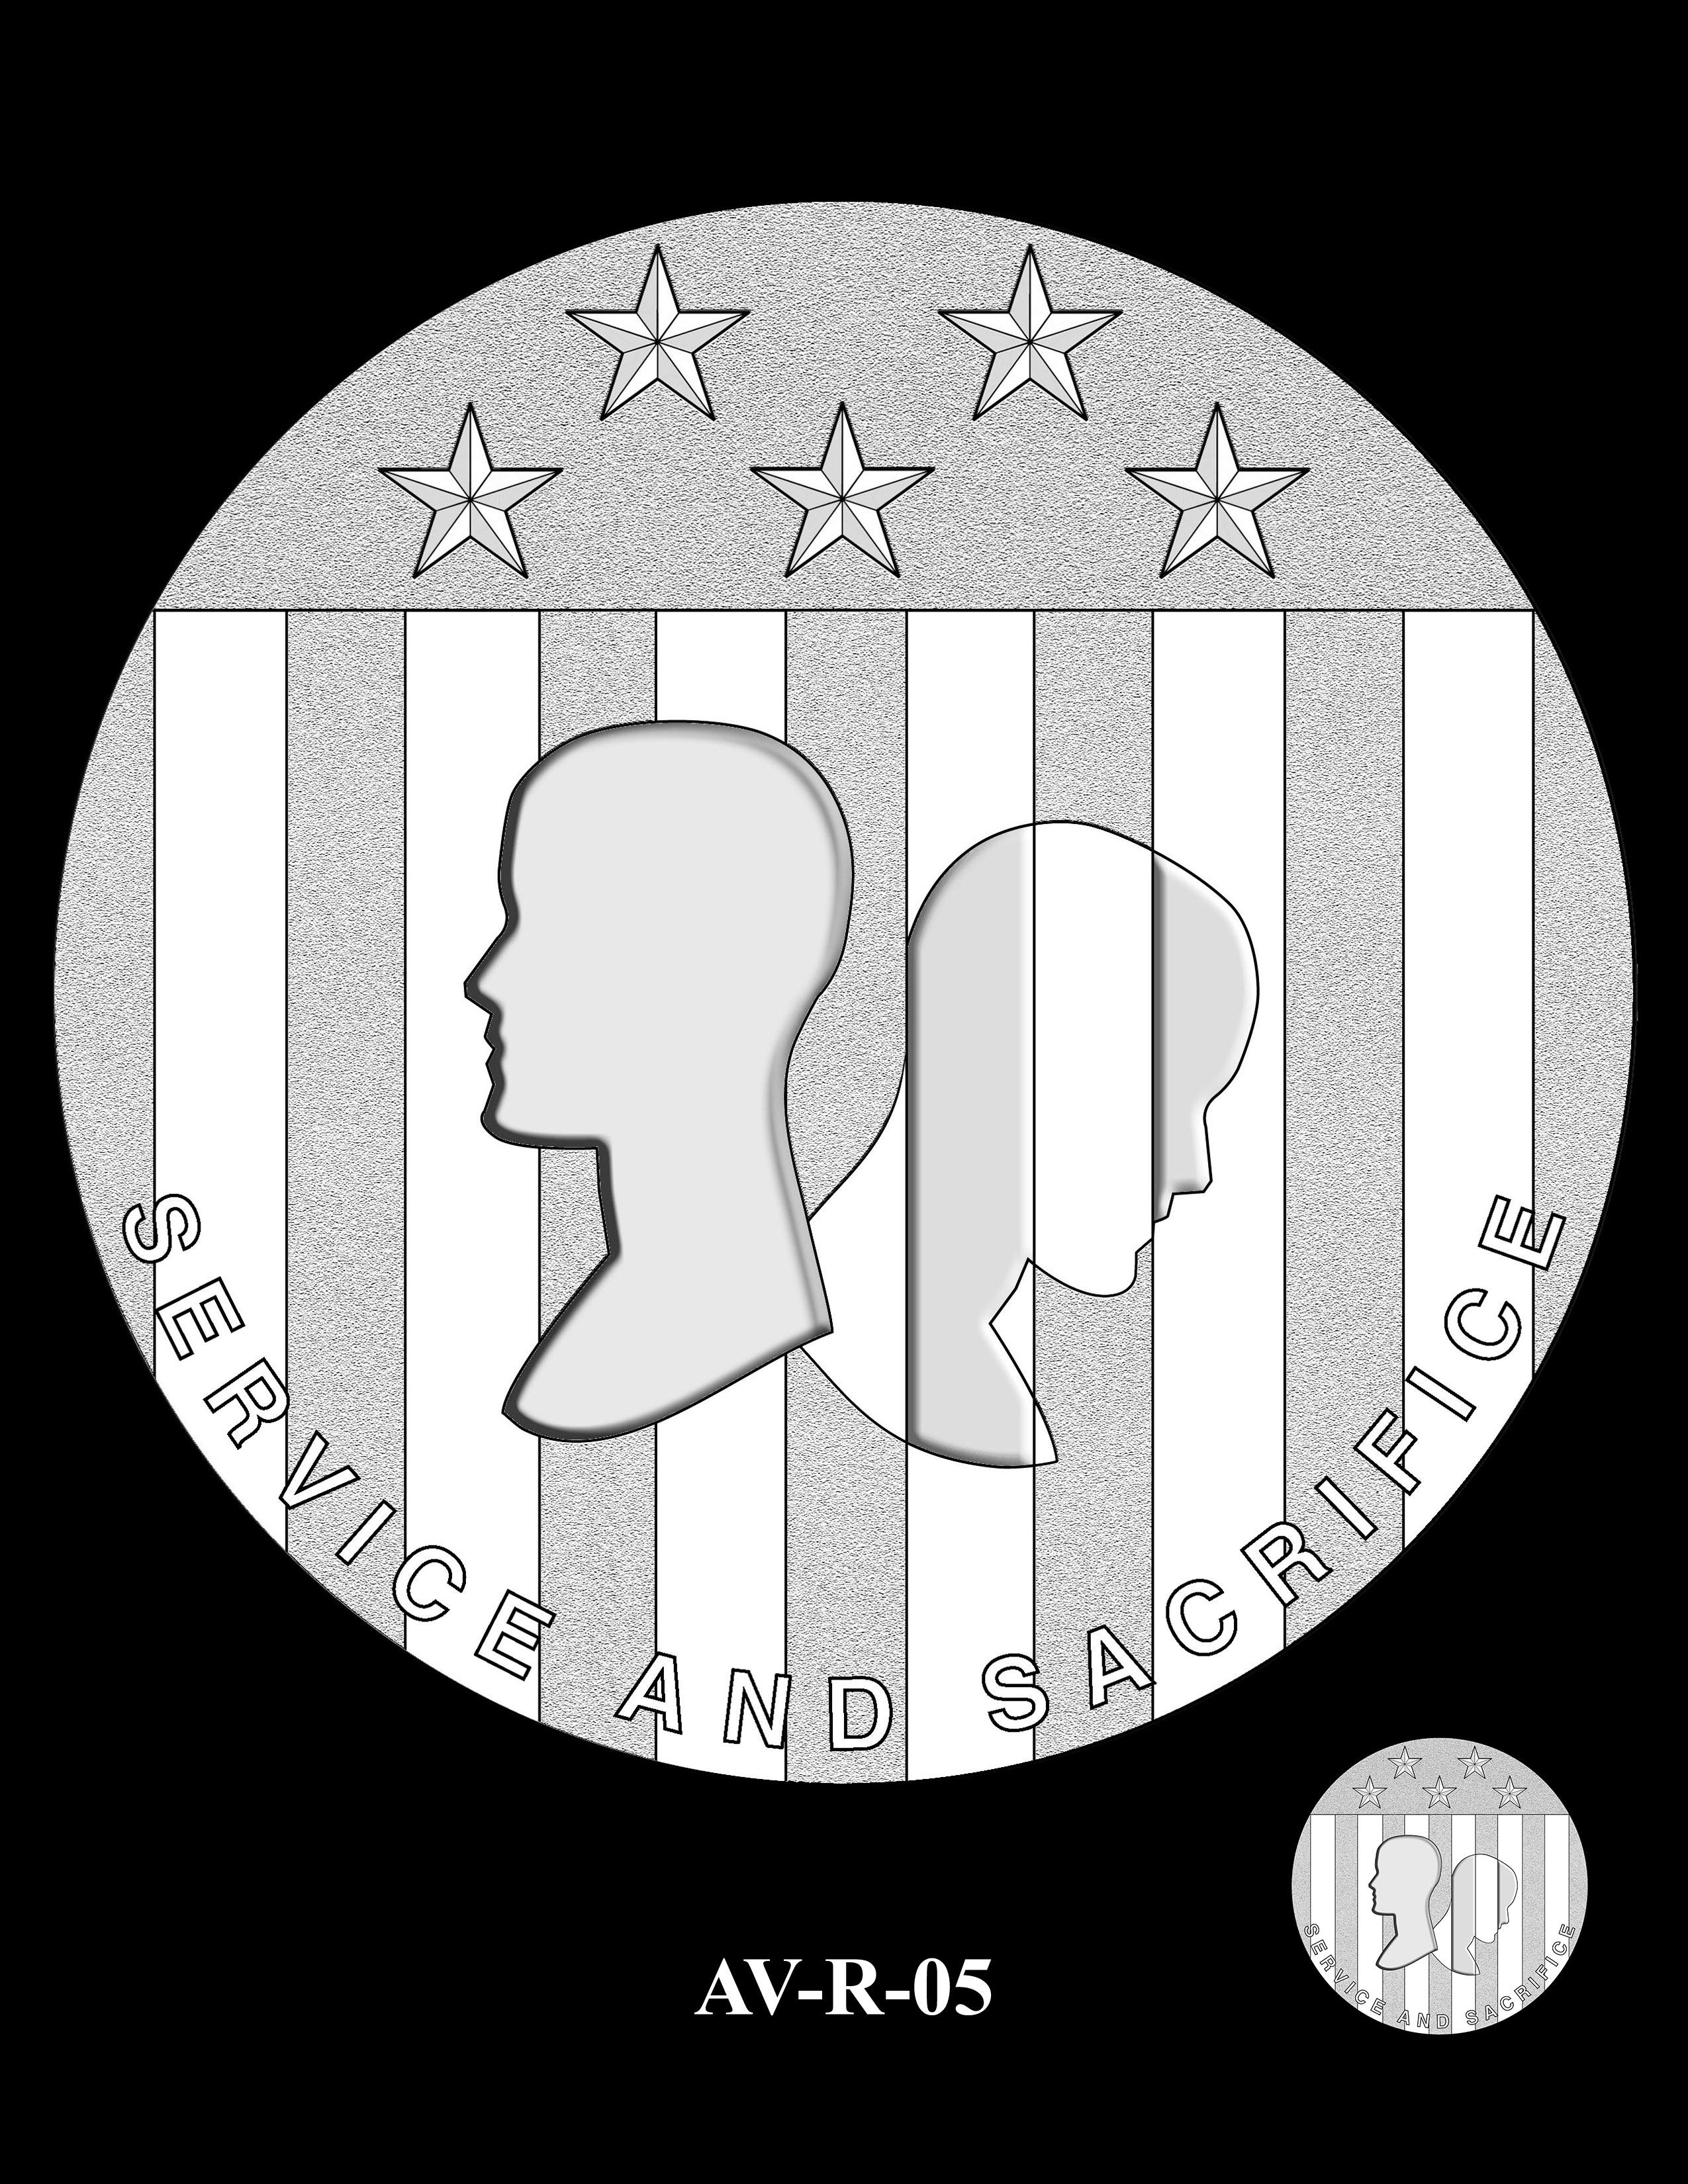 AV-R-05 - American Veterans Medal